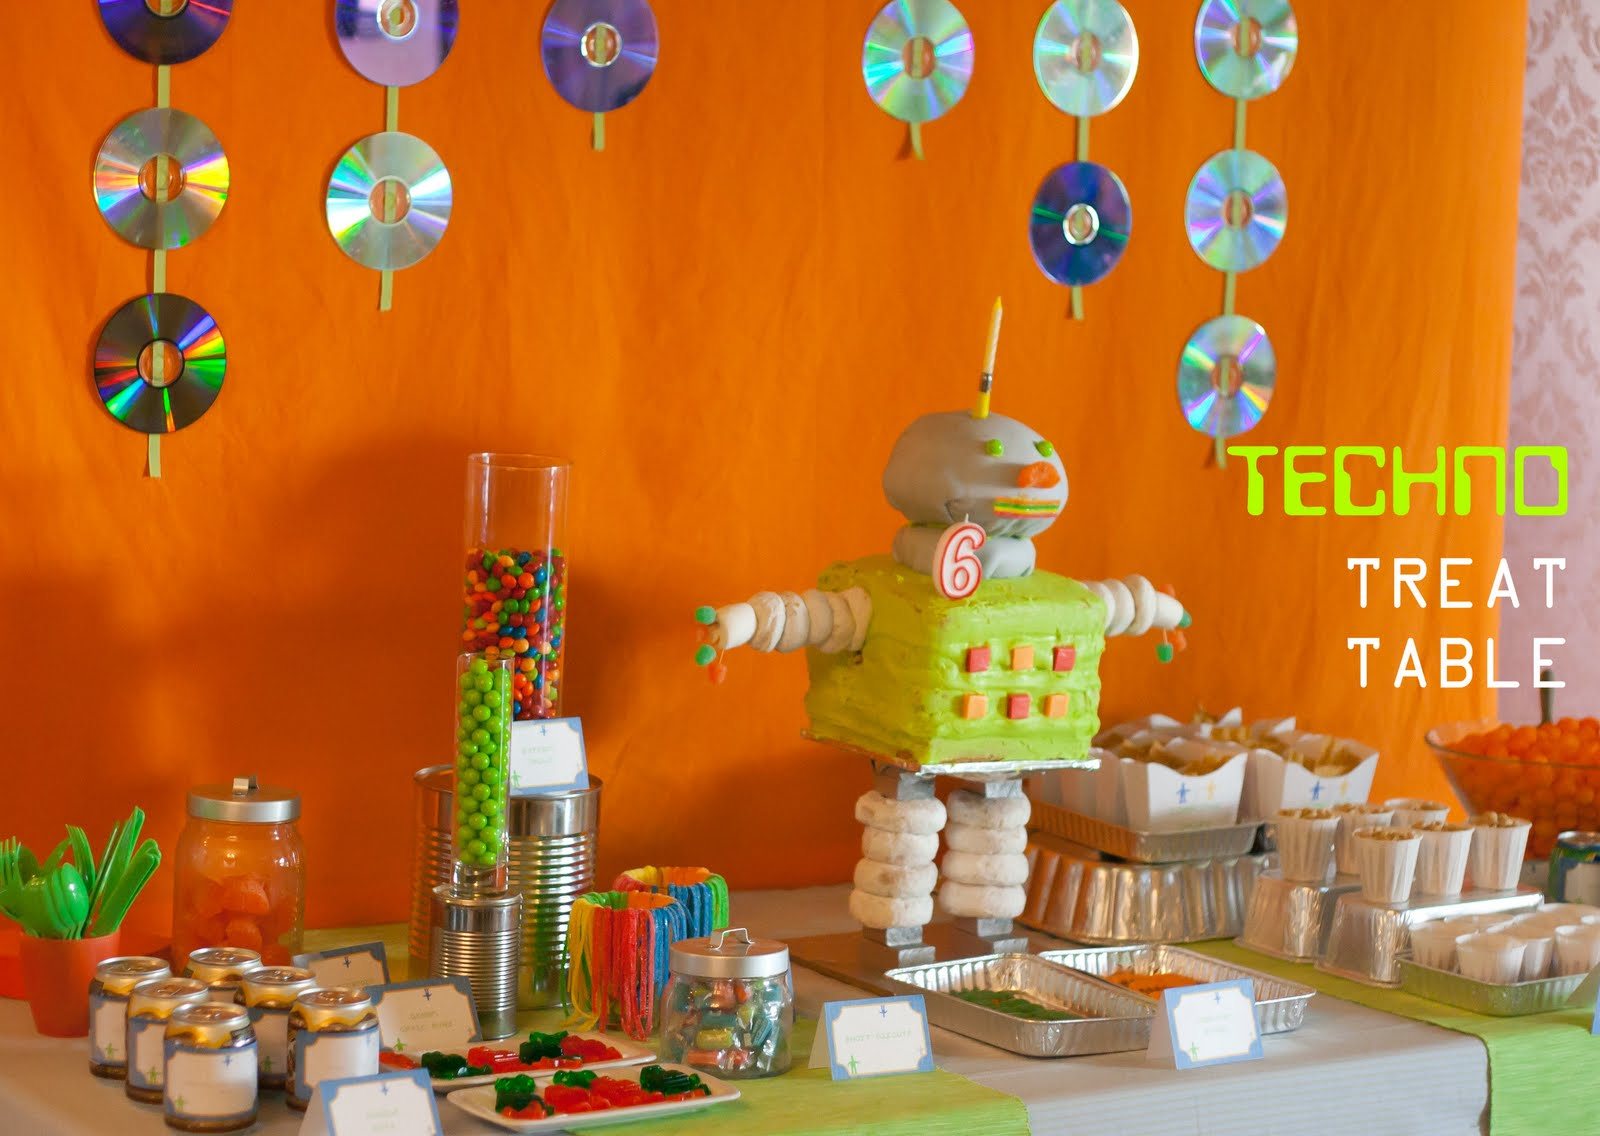 Robot Birthday Decorations: Robot Design Academy